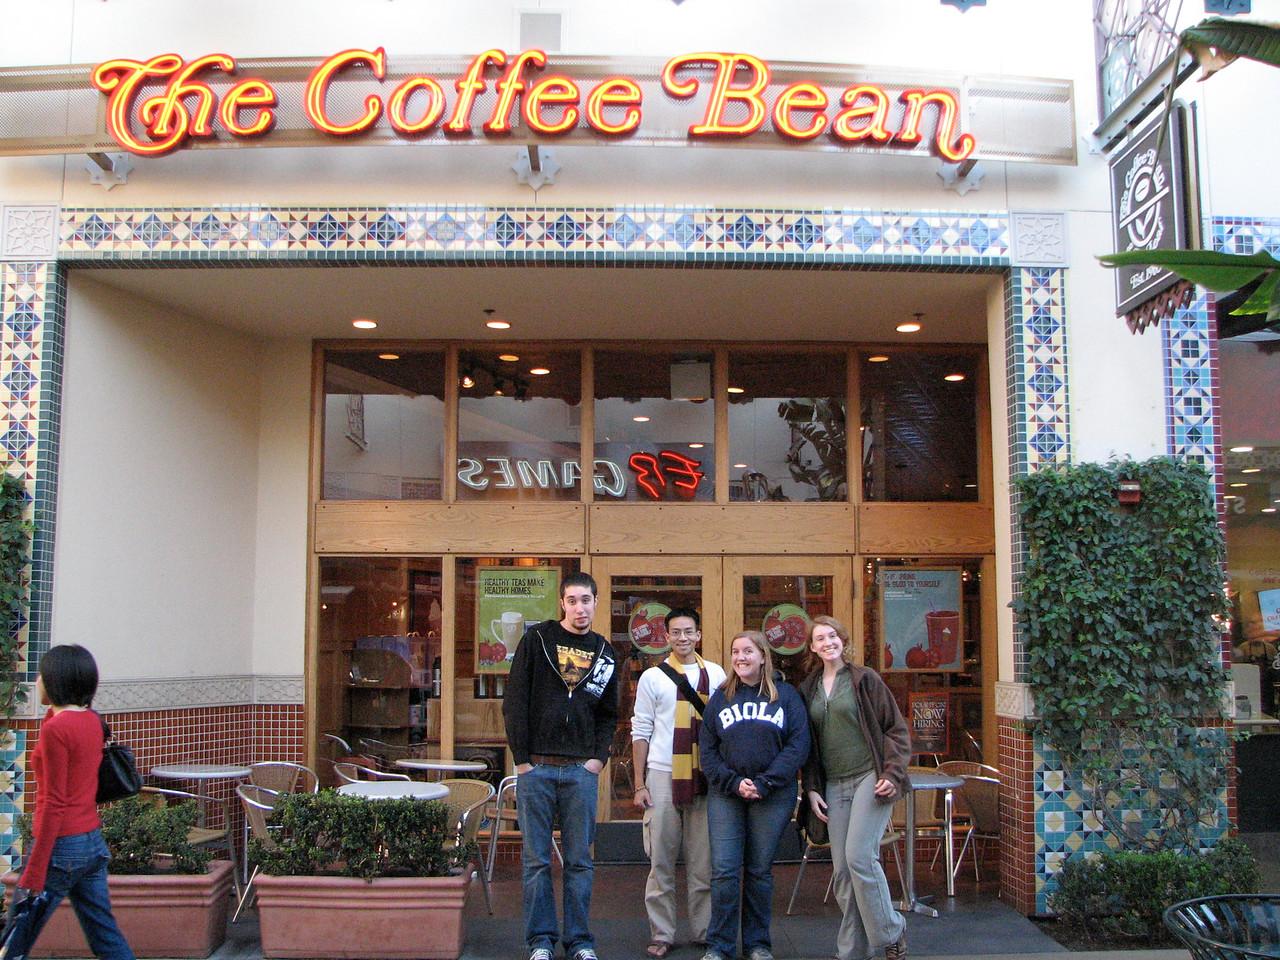 2007 03 02 Fri - Scavenger Hunt - The Coffee Bean